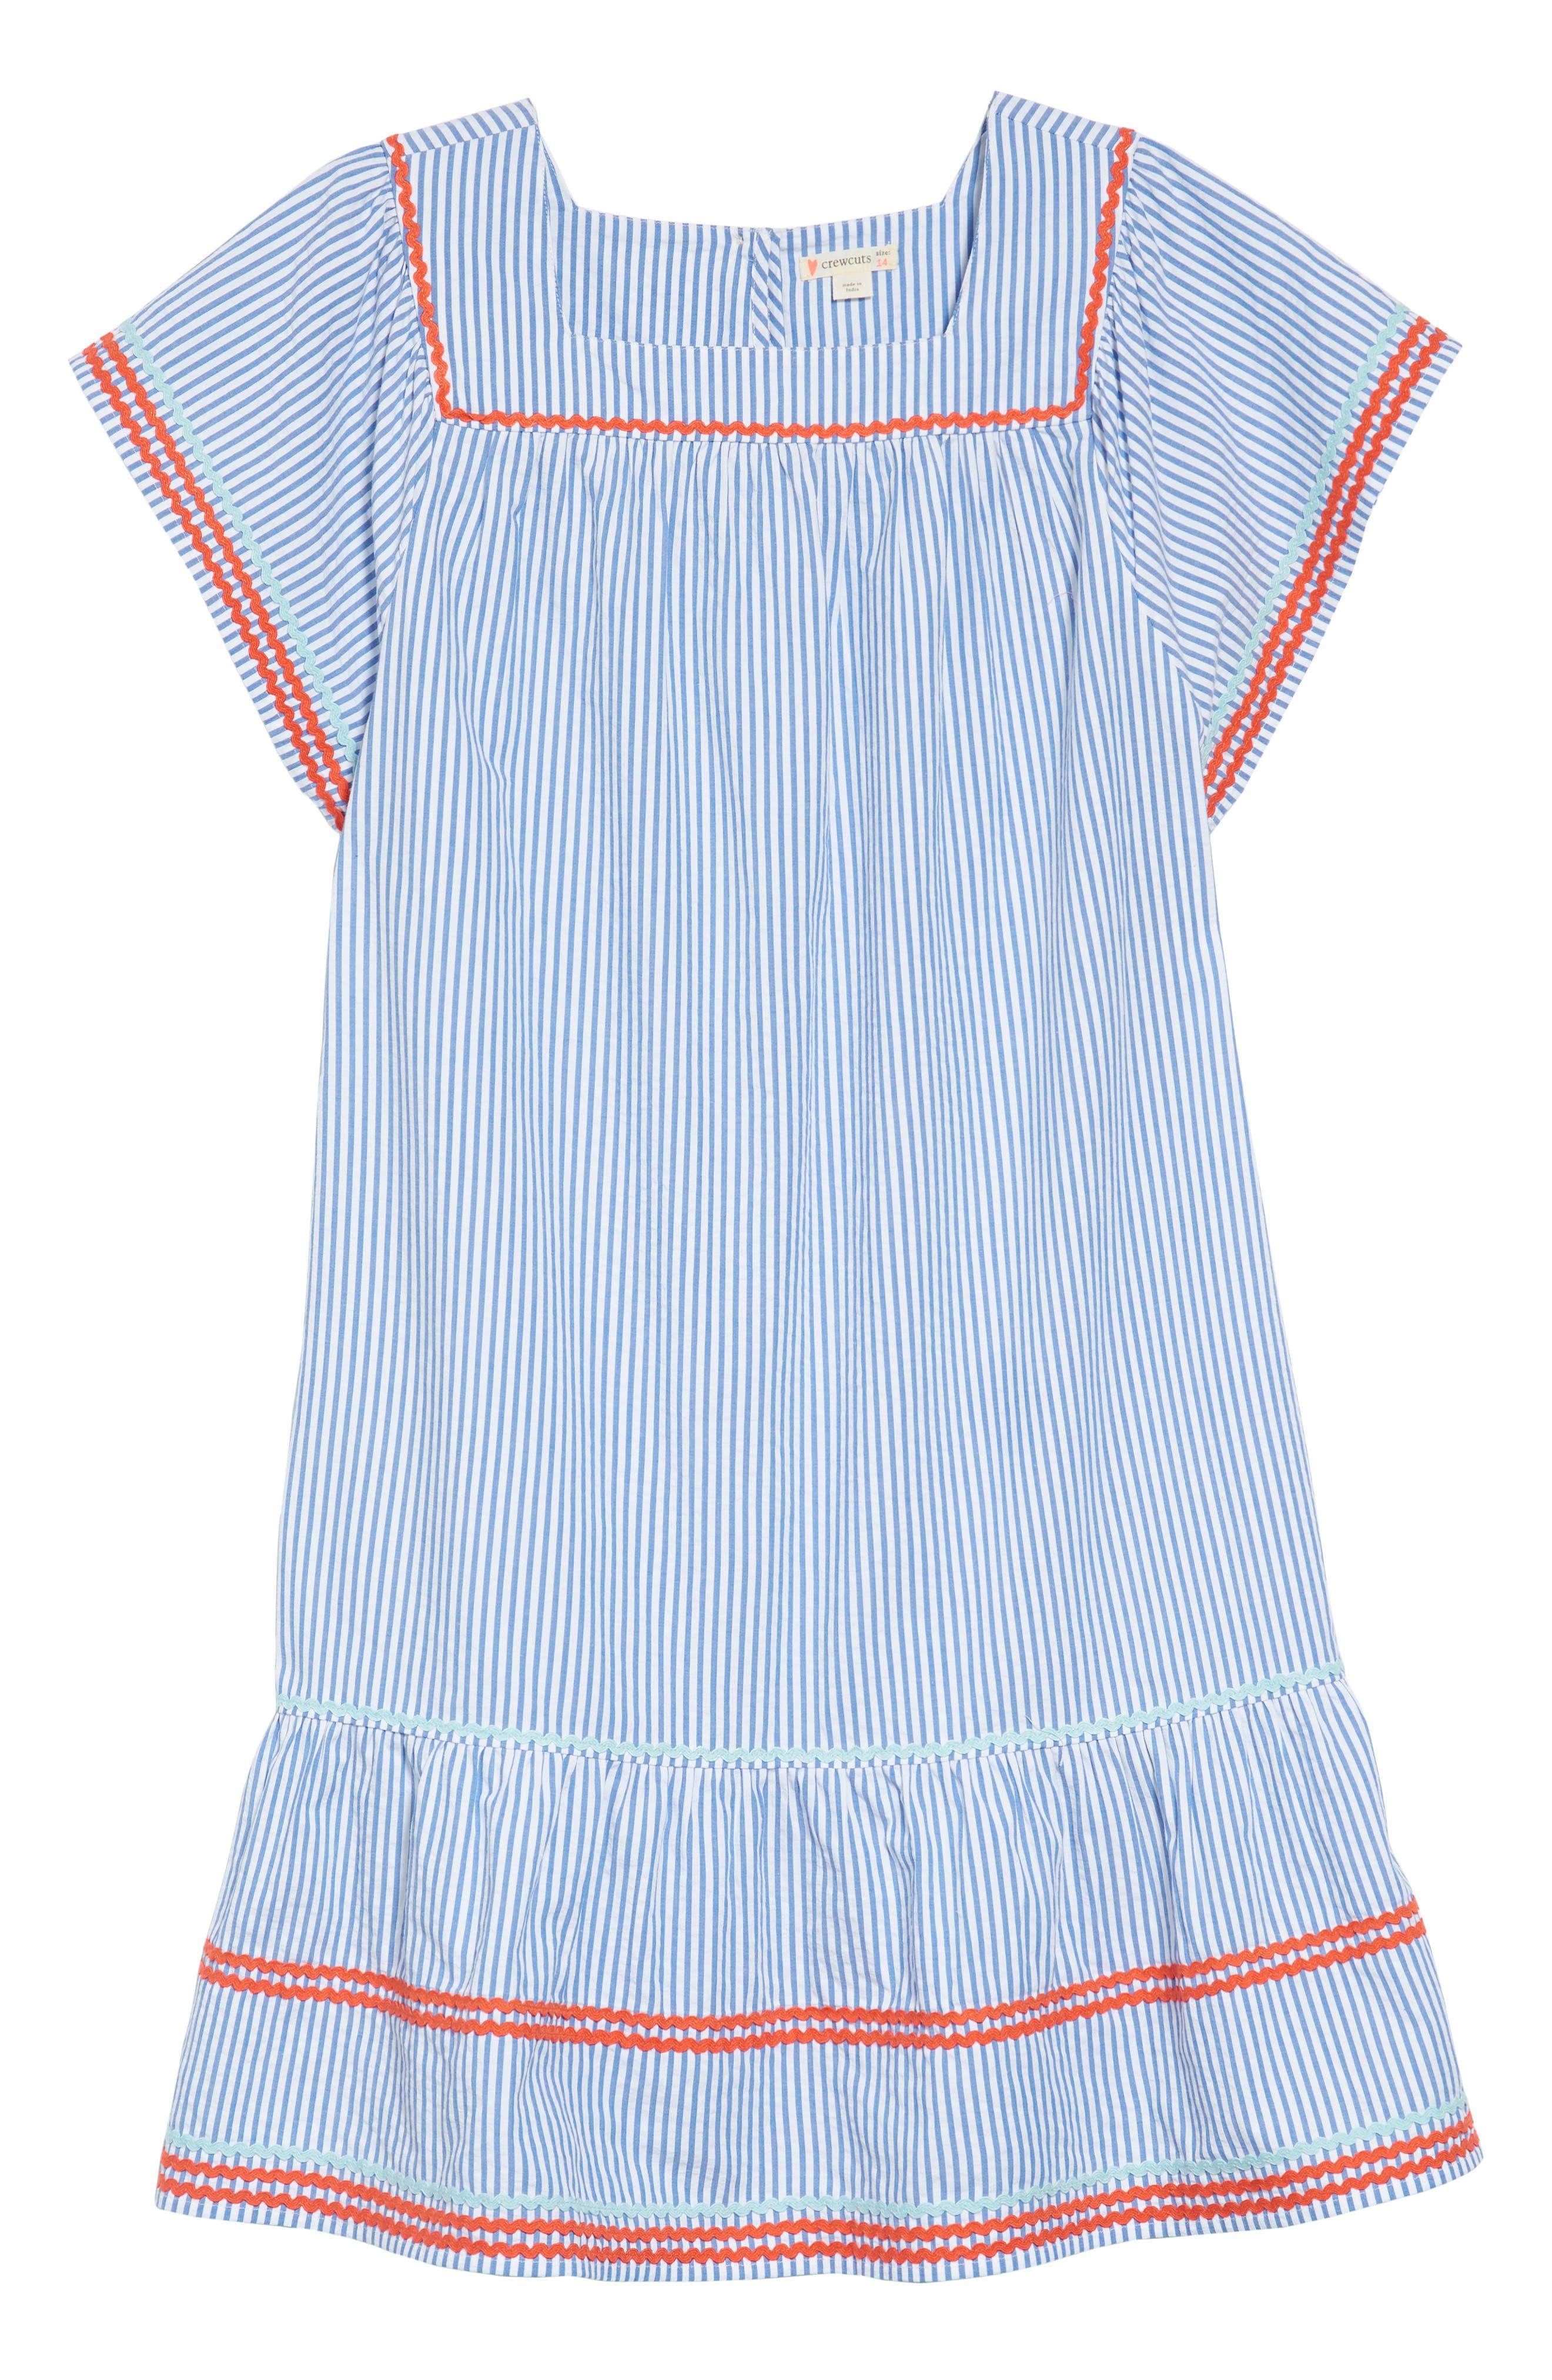 Bardot Rickrack Seersucker Dress,                         Main,                         color, 400